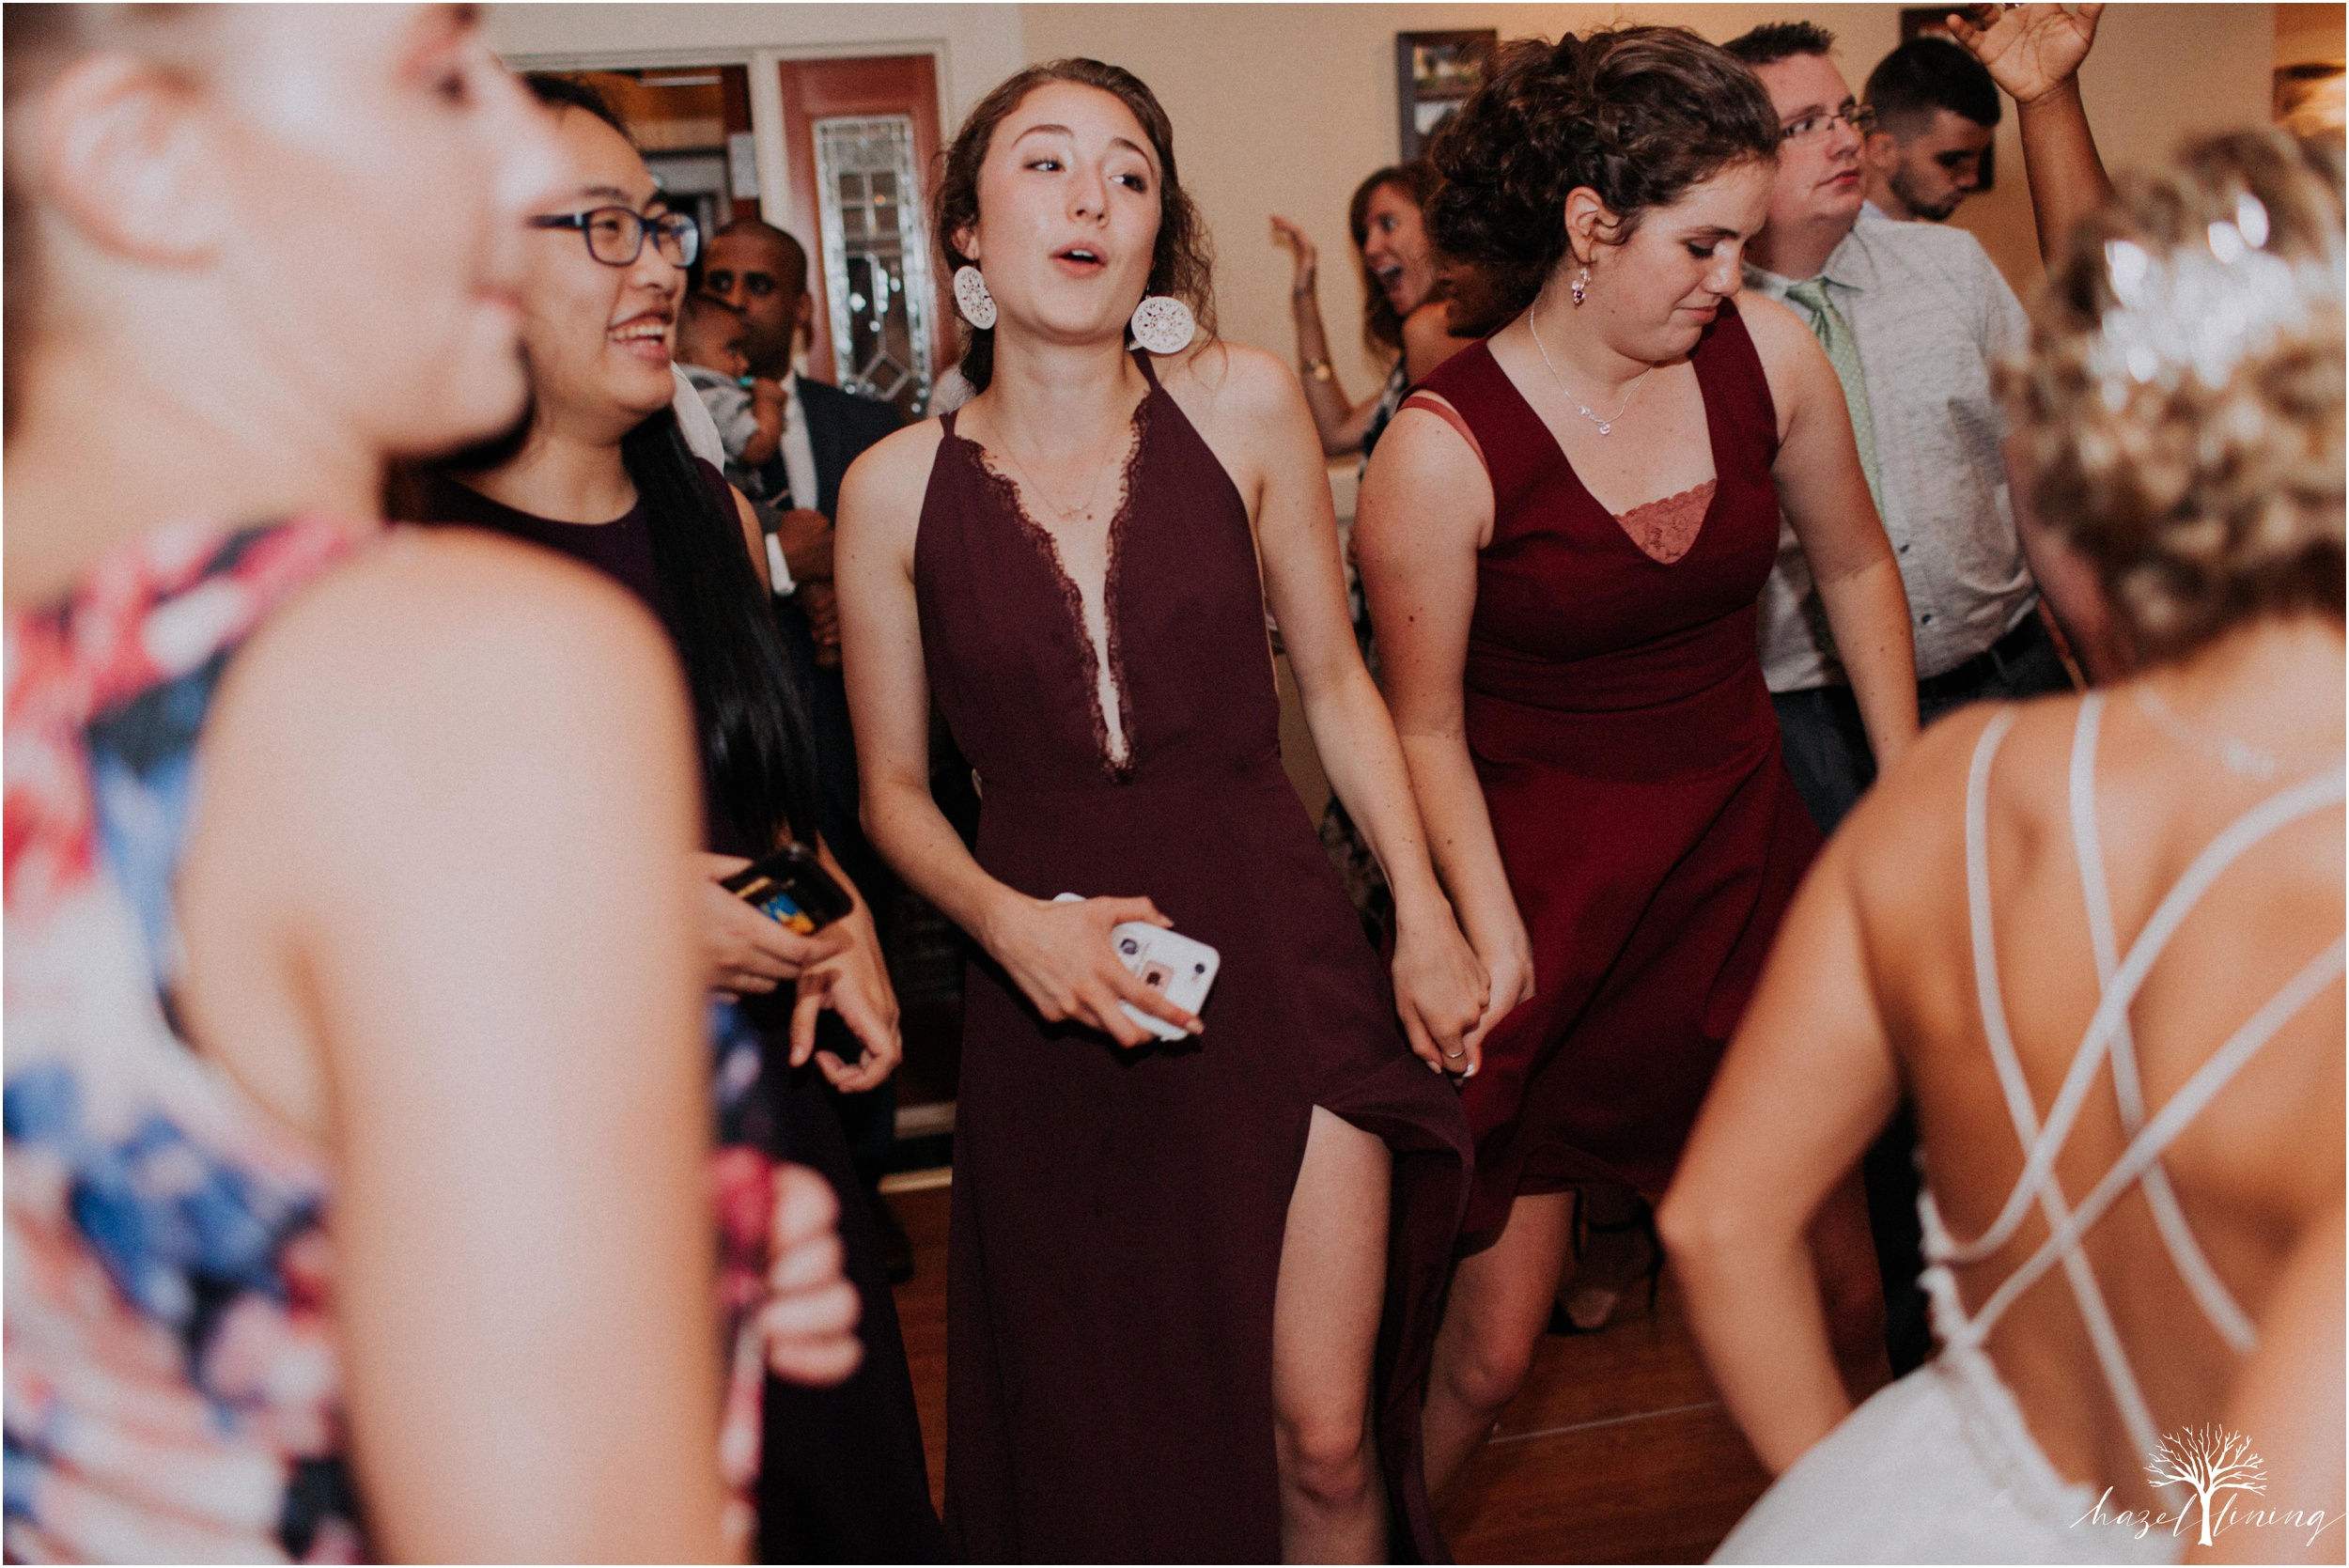 jonathan-weibel-becky-haywood-loft-at-sweetwater-cc-pennsburg-pennsylvania-rainy-day-summer-wedding-hazel-lining-travel-wedding-elopement-photography_0152.jpg